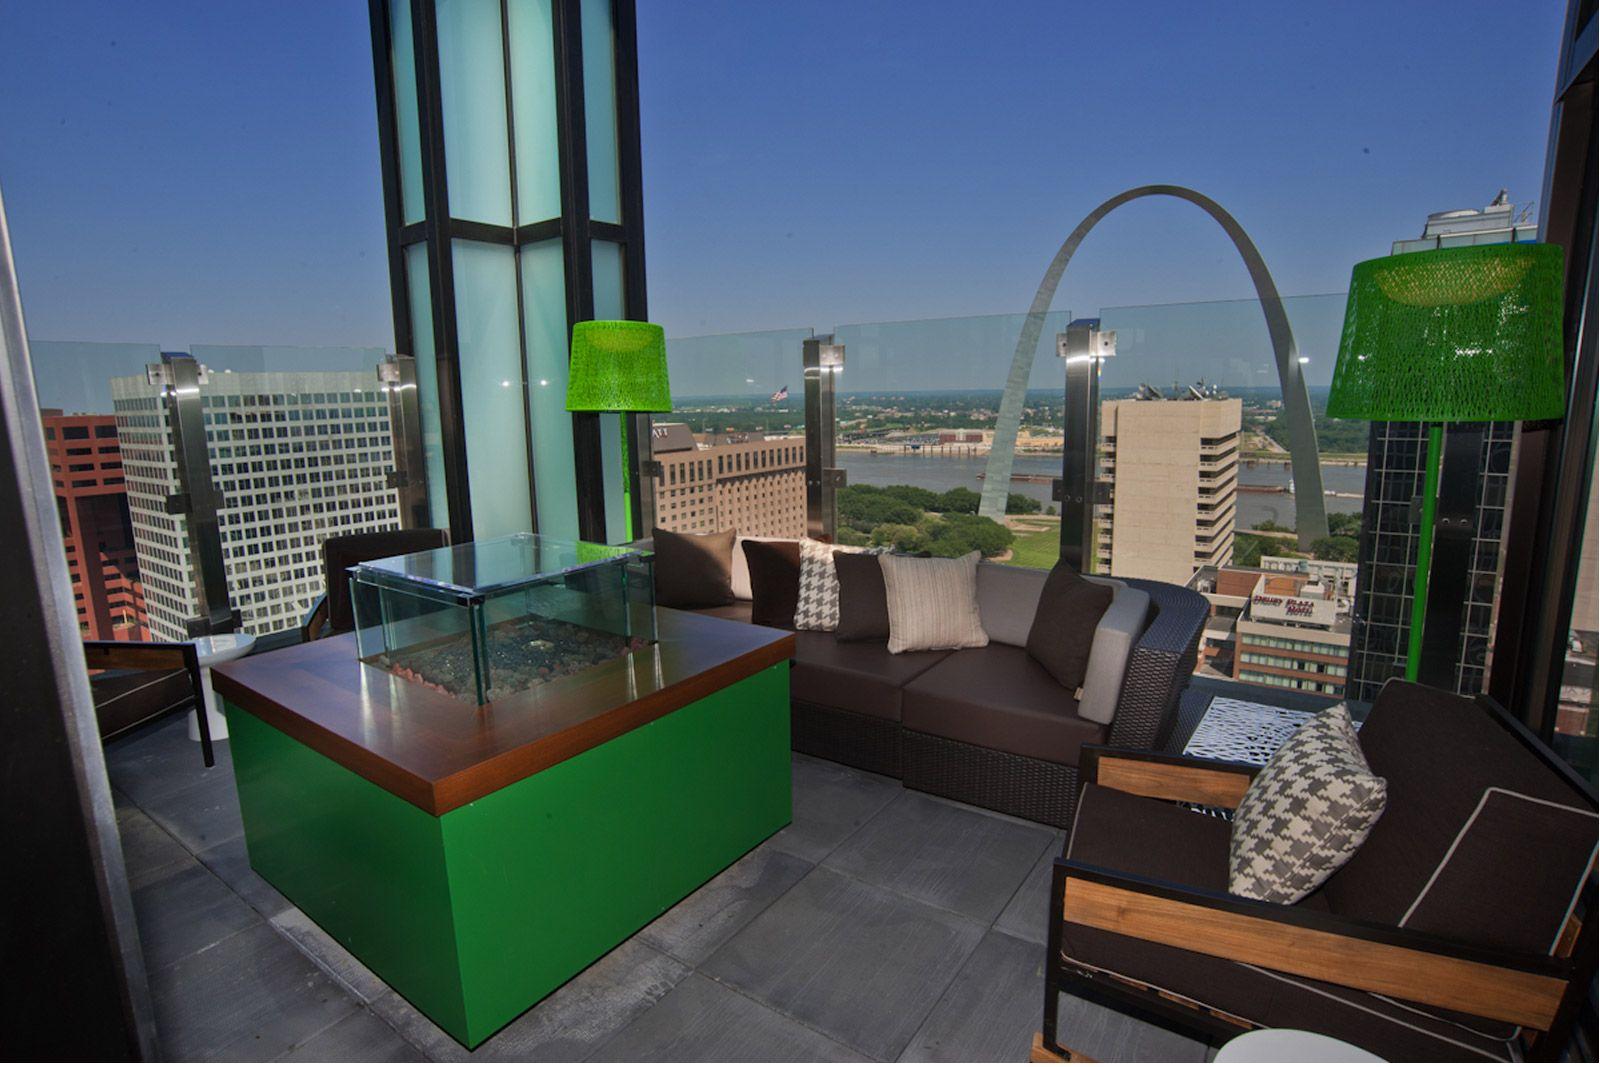 360 rooftop in st louis for drinks indoor and outdoor